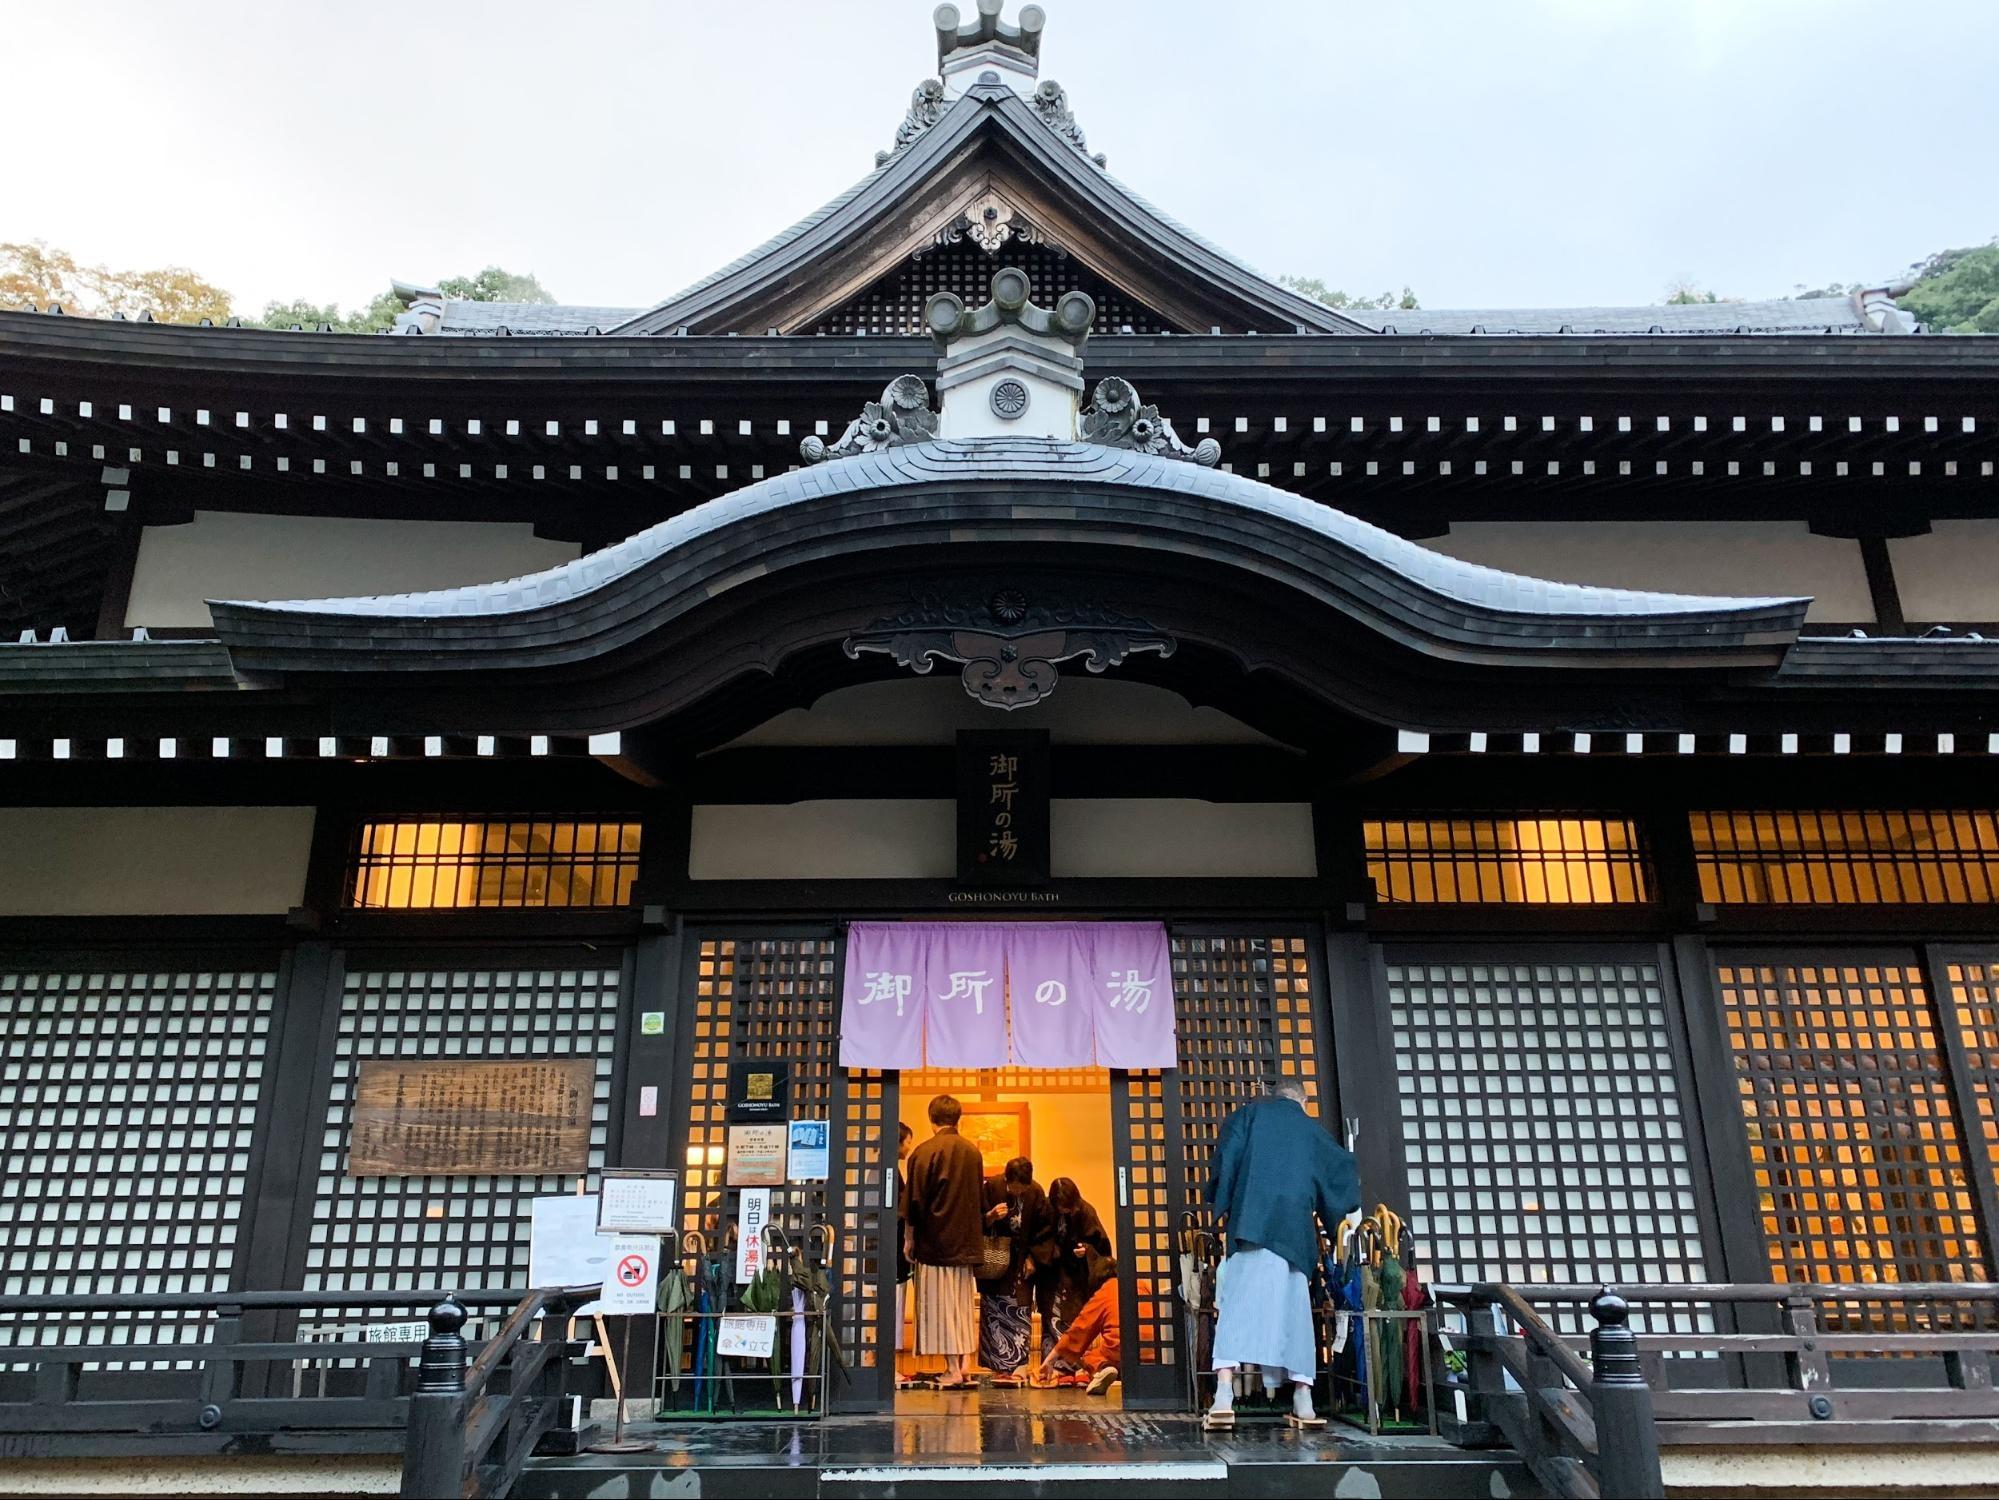 Goshonoyu Bath at Kinosaki Onsen Town